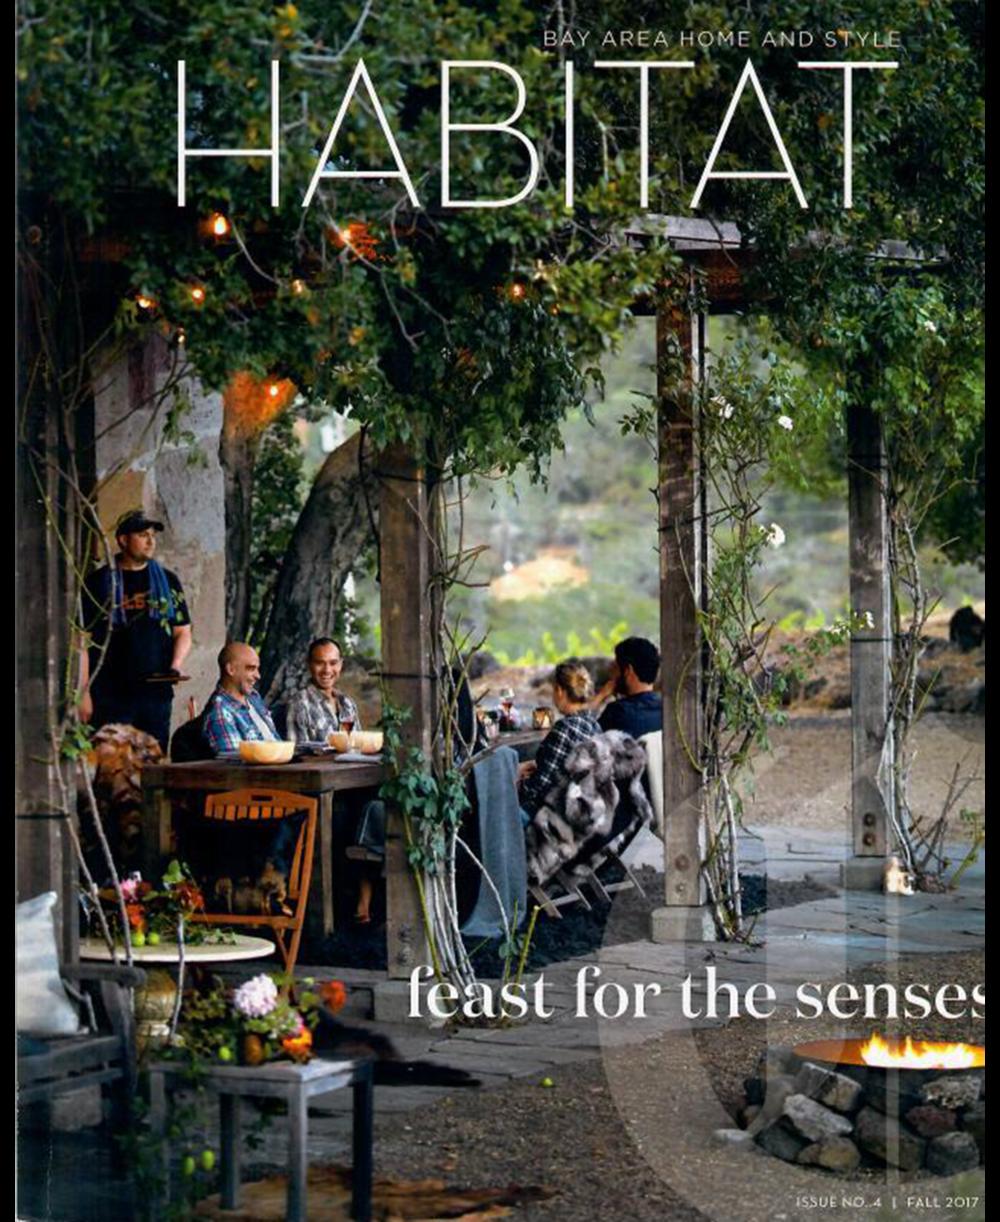 habitat_cover.png